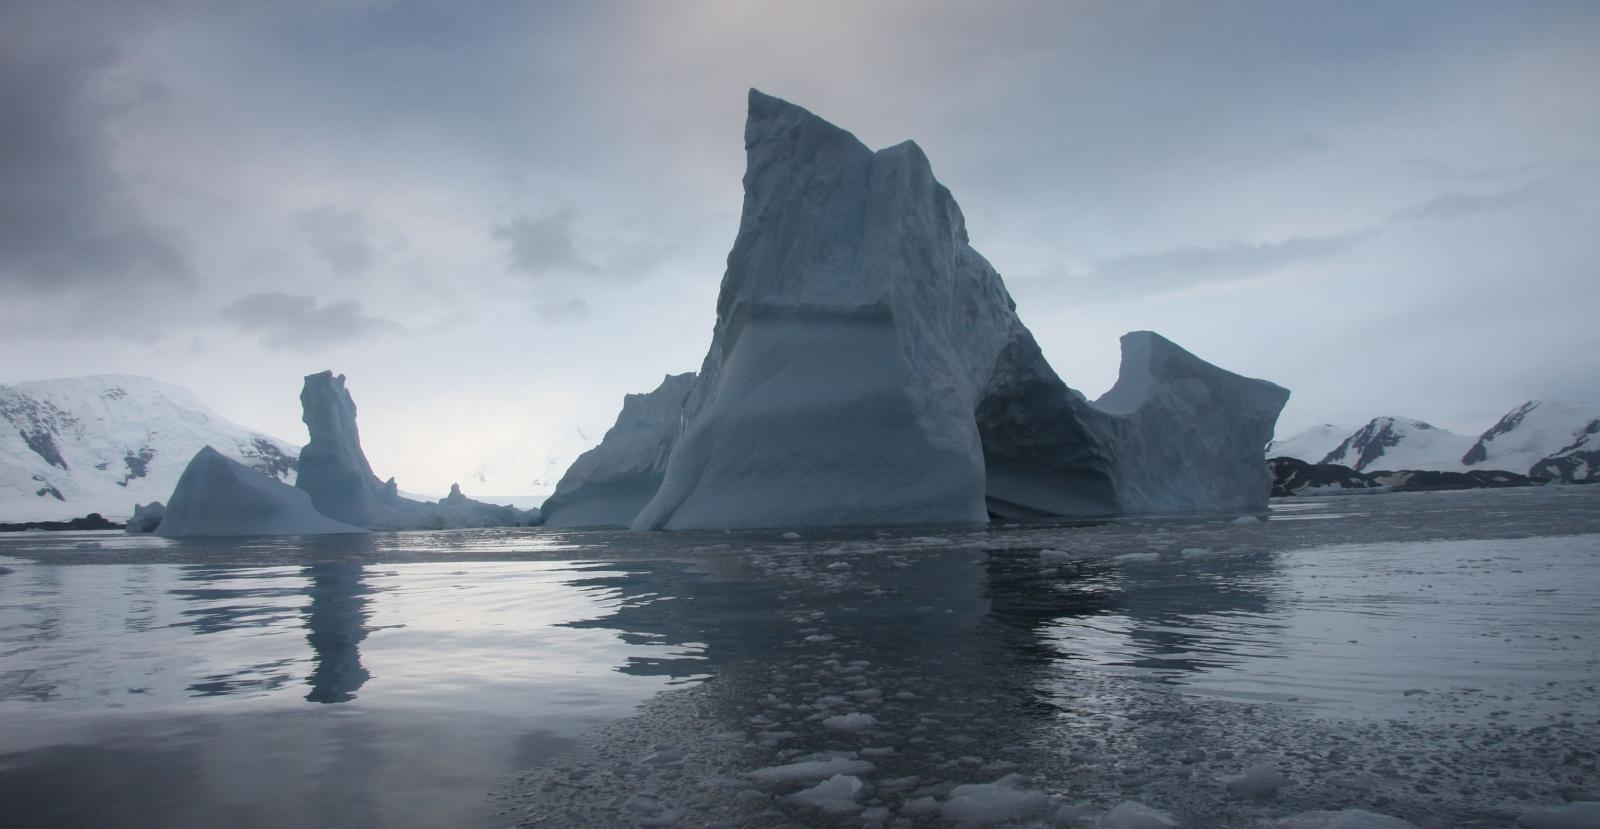 Larsen B ice shelf